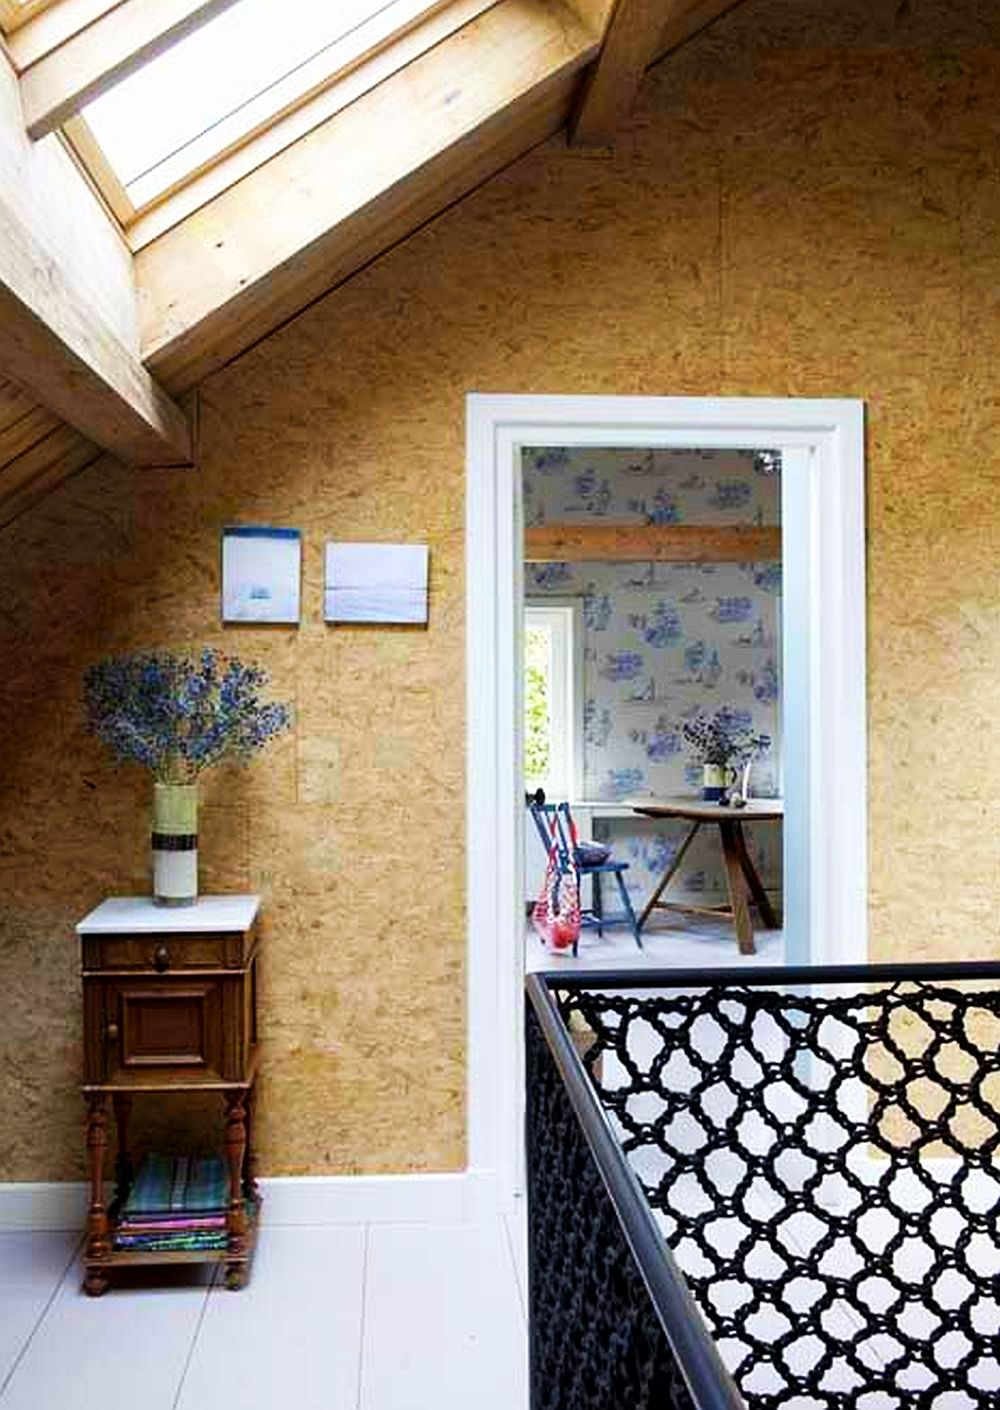 adelaparvu.com about modern farm, designer Larissa van Seumeren, Photo Viva Vida and Living Agency (17)